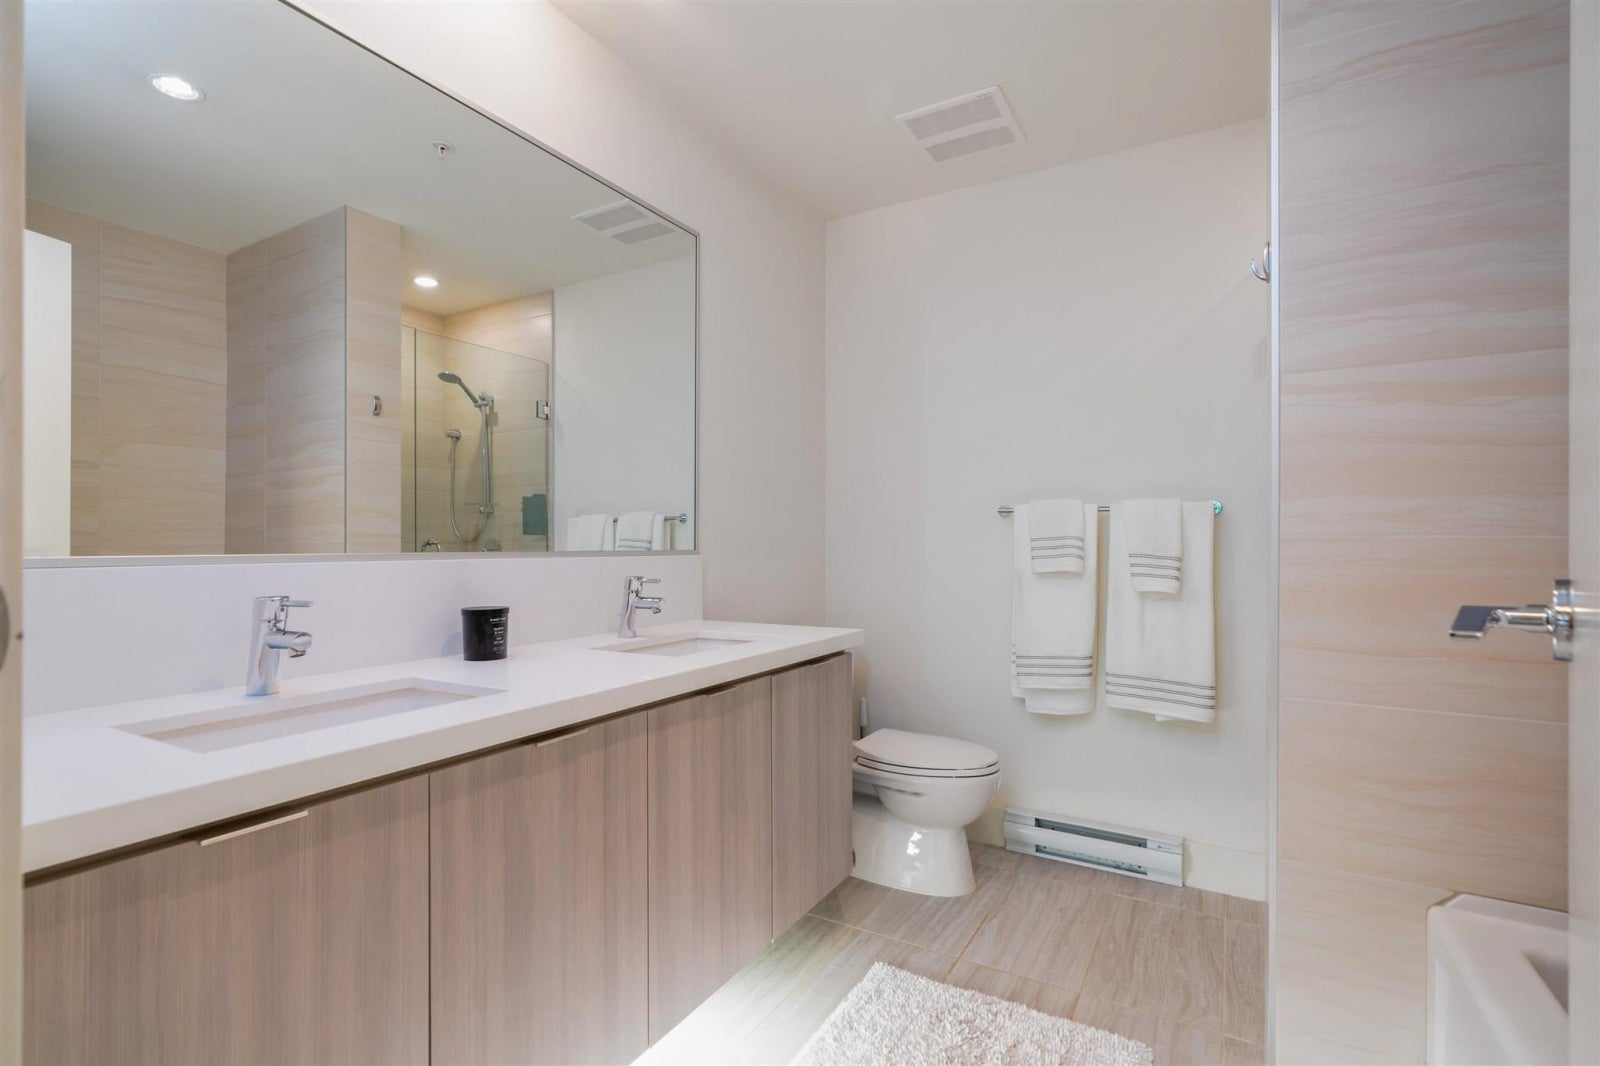 222 3602 ALDERCREST DRIVE - Roche Point Apartment/Condo for sale, 2 Bedrooms (R2603975) #12